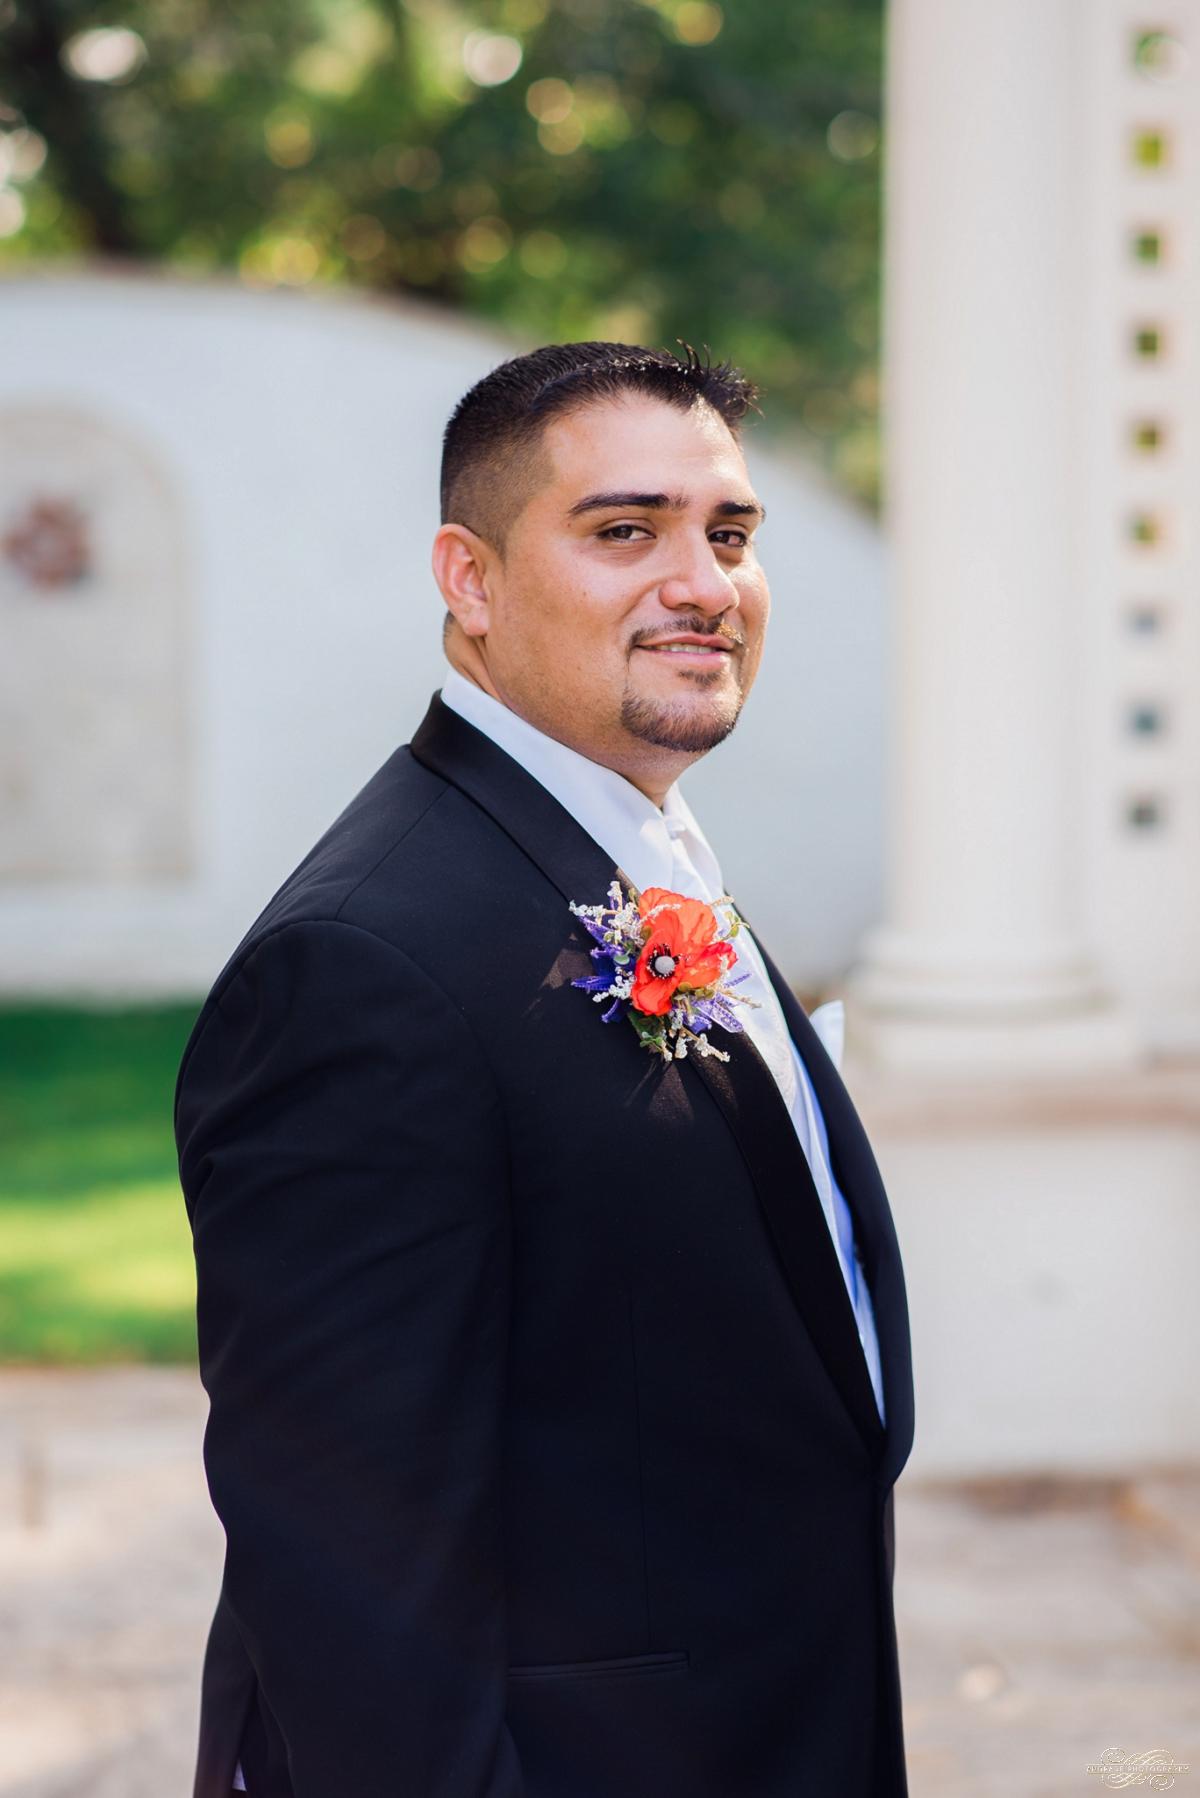 Janette + Louie Estebans Wedding Photography in Naperville - Naperville Wedding Photographer_0051.jpg